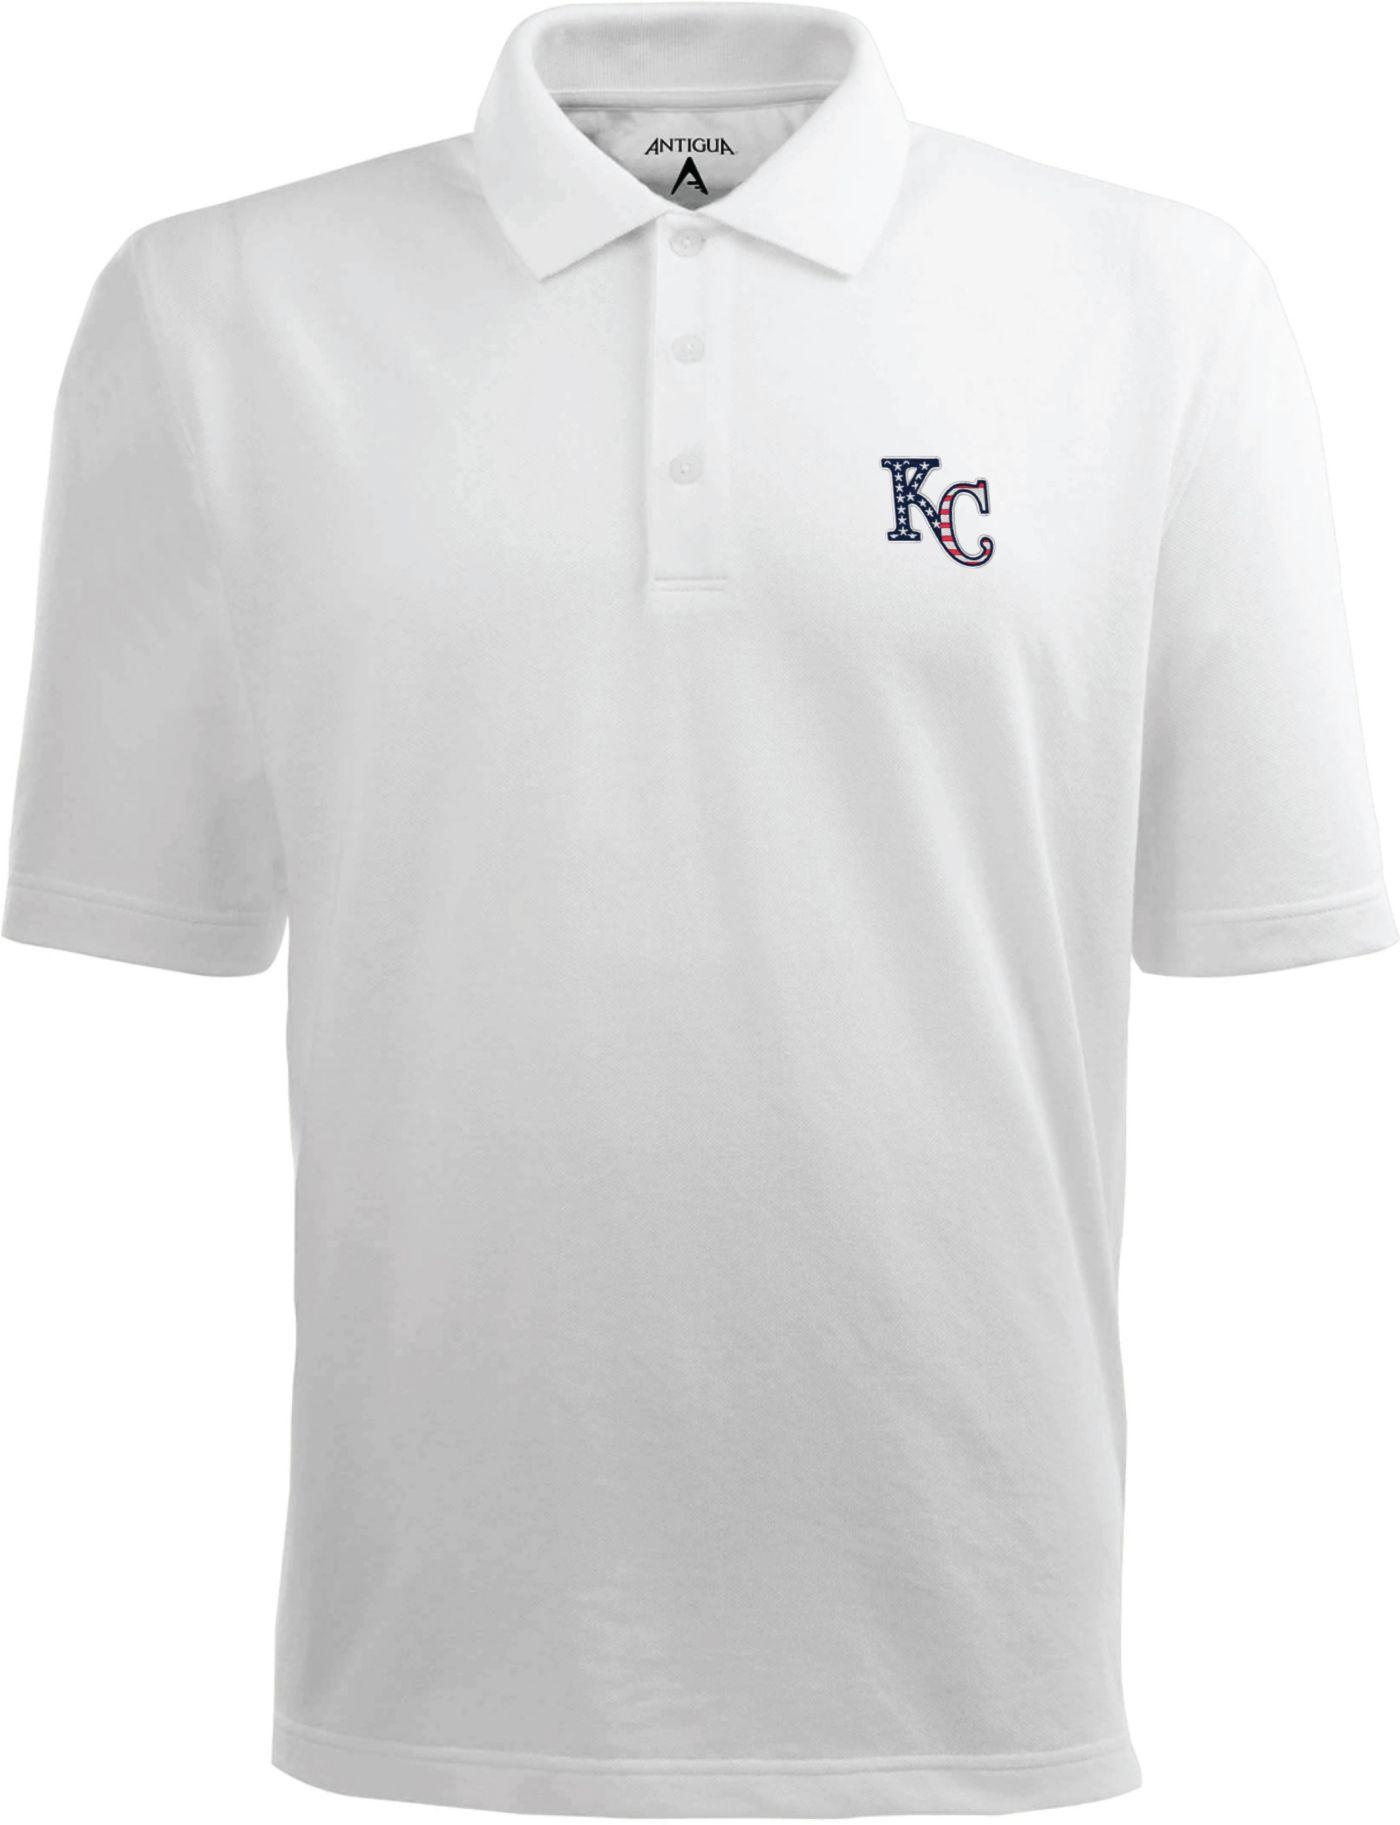 Antigua Men's Kansas City Royals Xtra-Lite Patriotic Logo White Pique Performance Polo